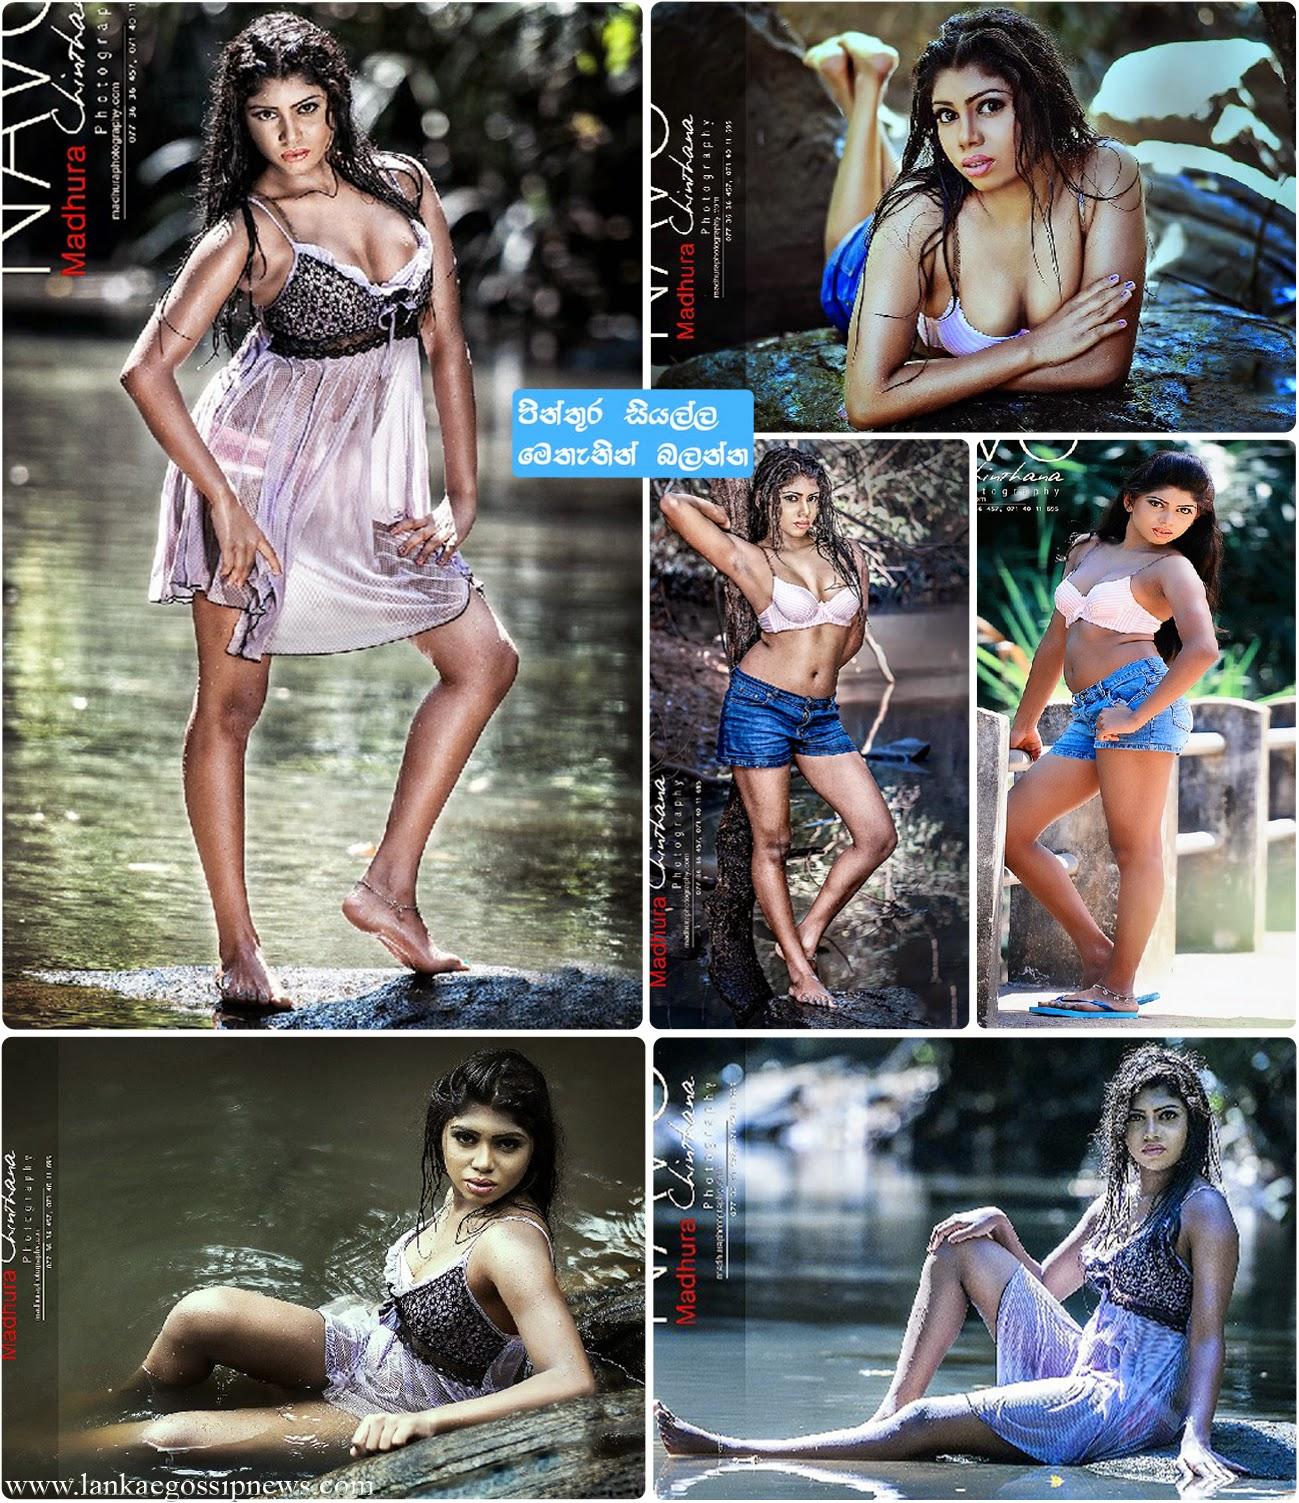 http://gallery.egossip.lk/2015/01/navoddya.html